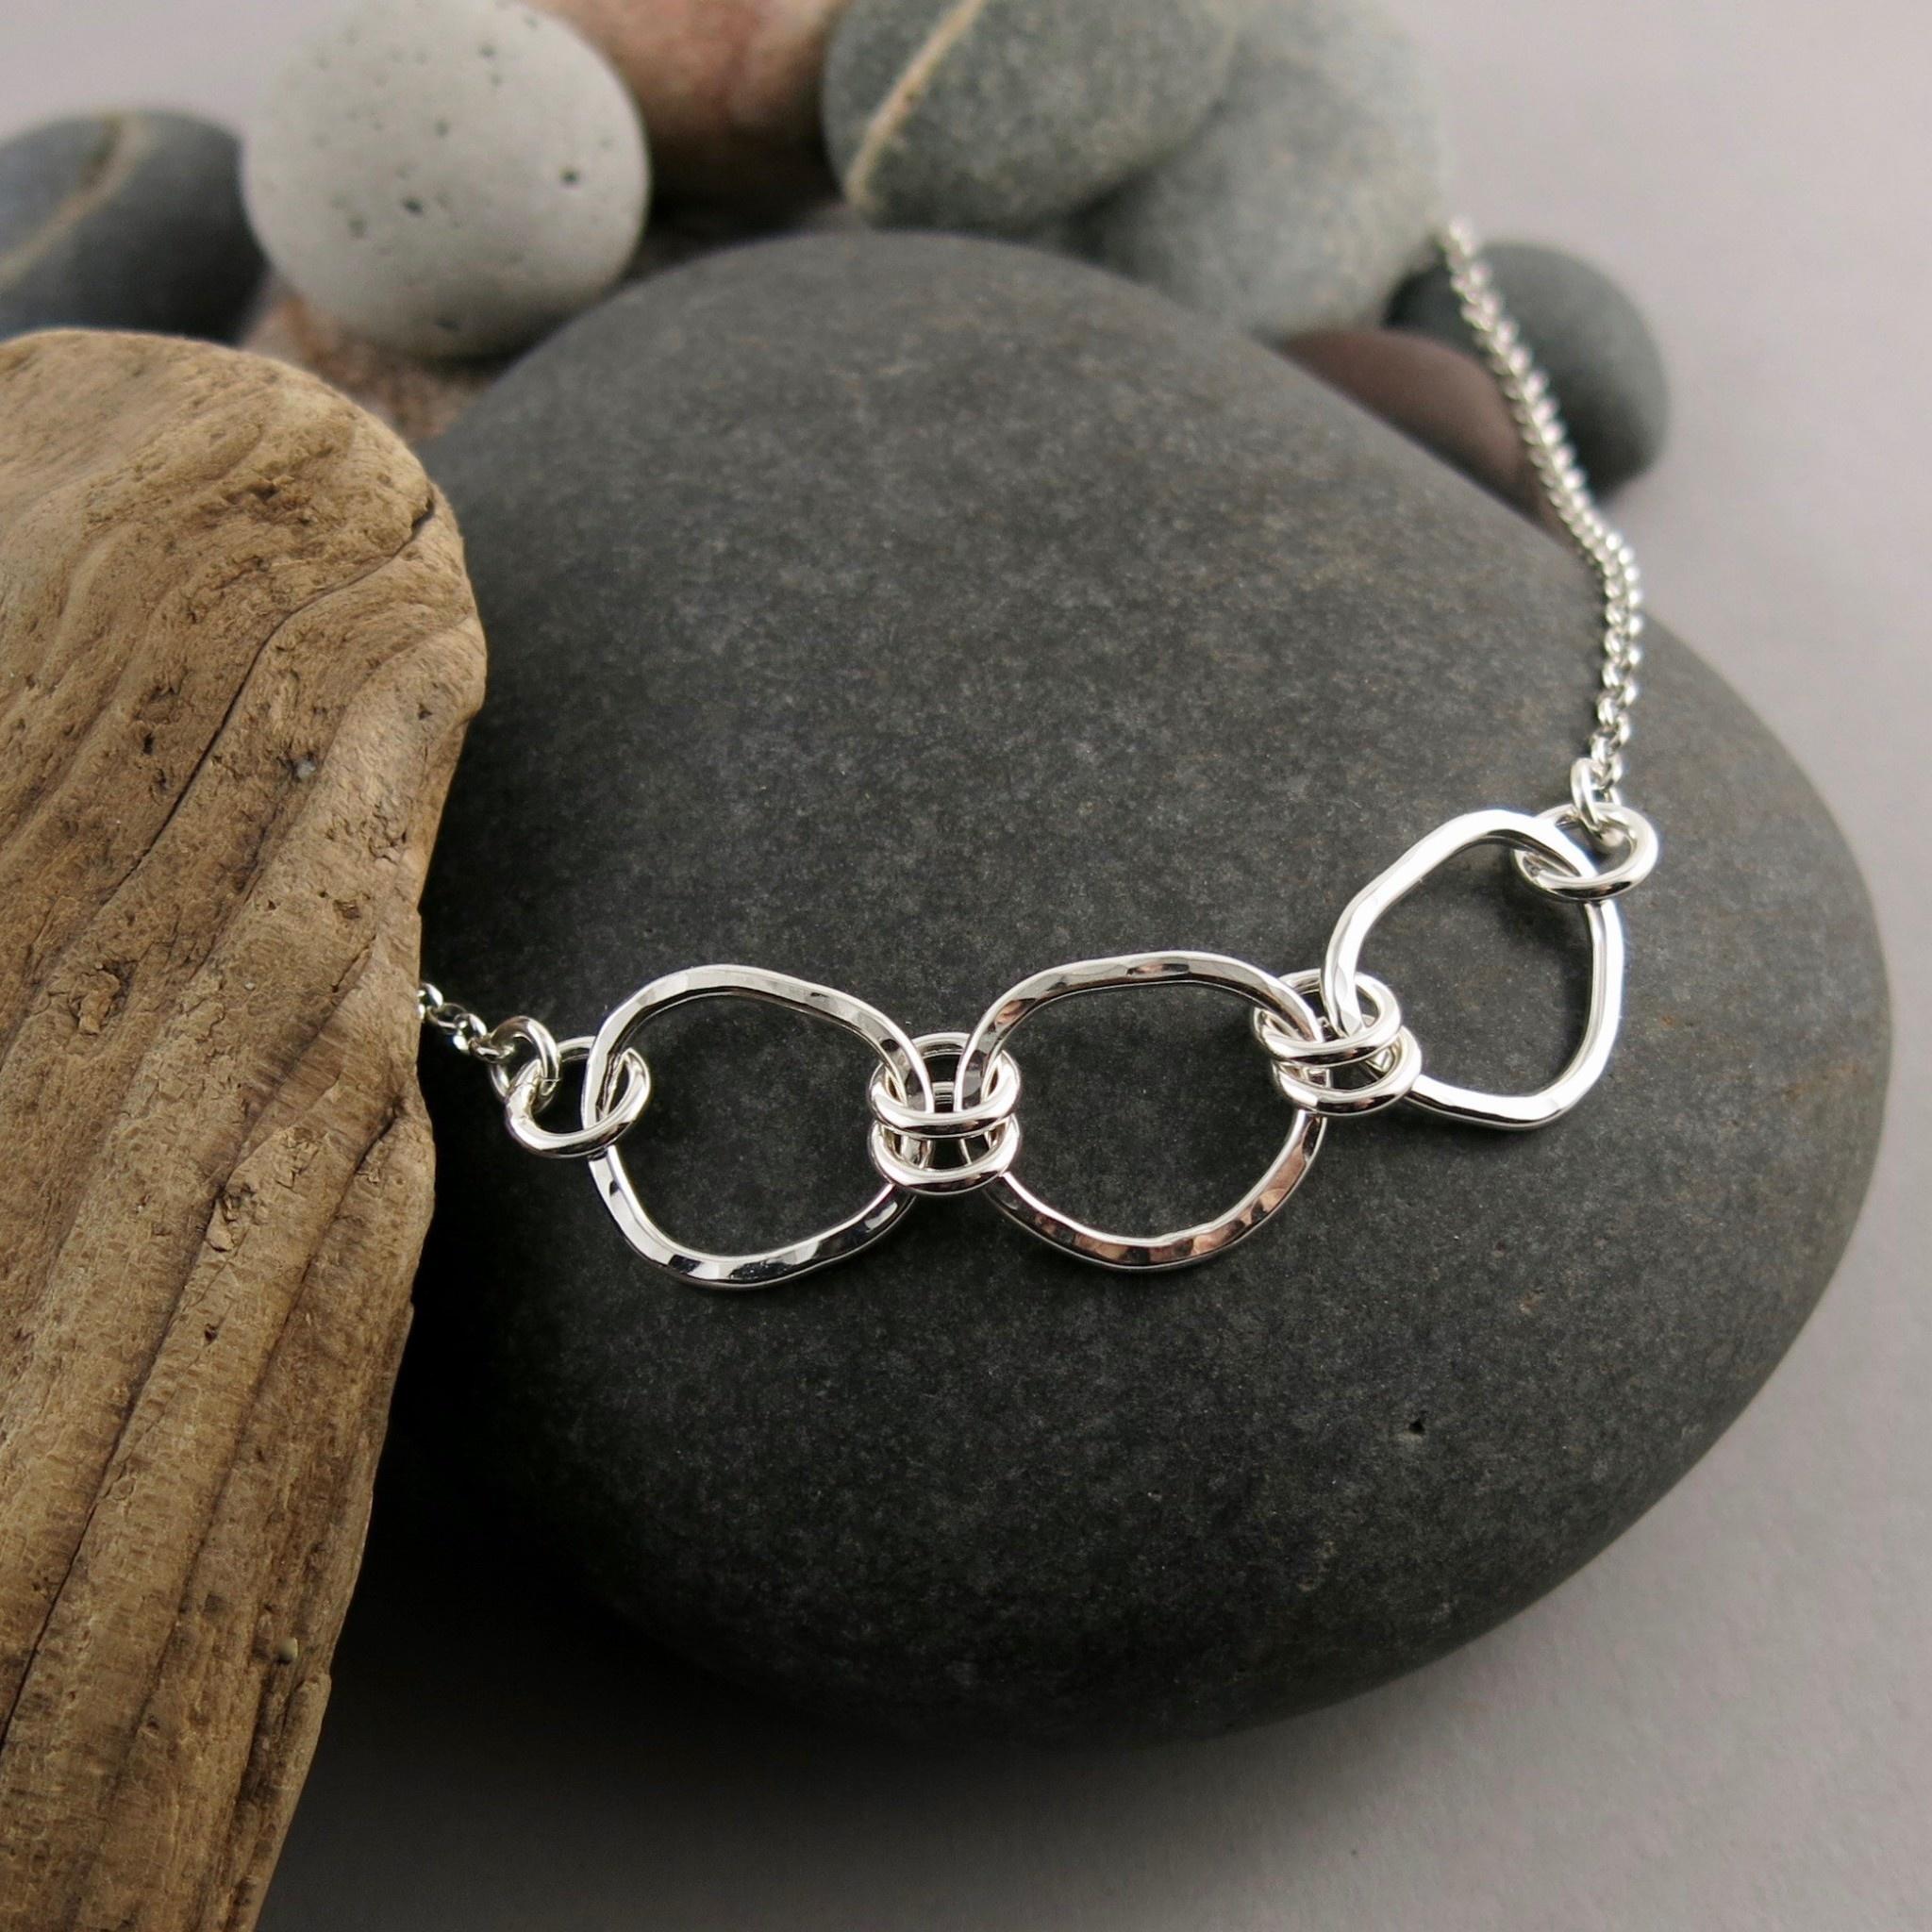 Mikel Grant Jewelry Coast Trio Necklace